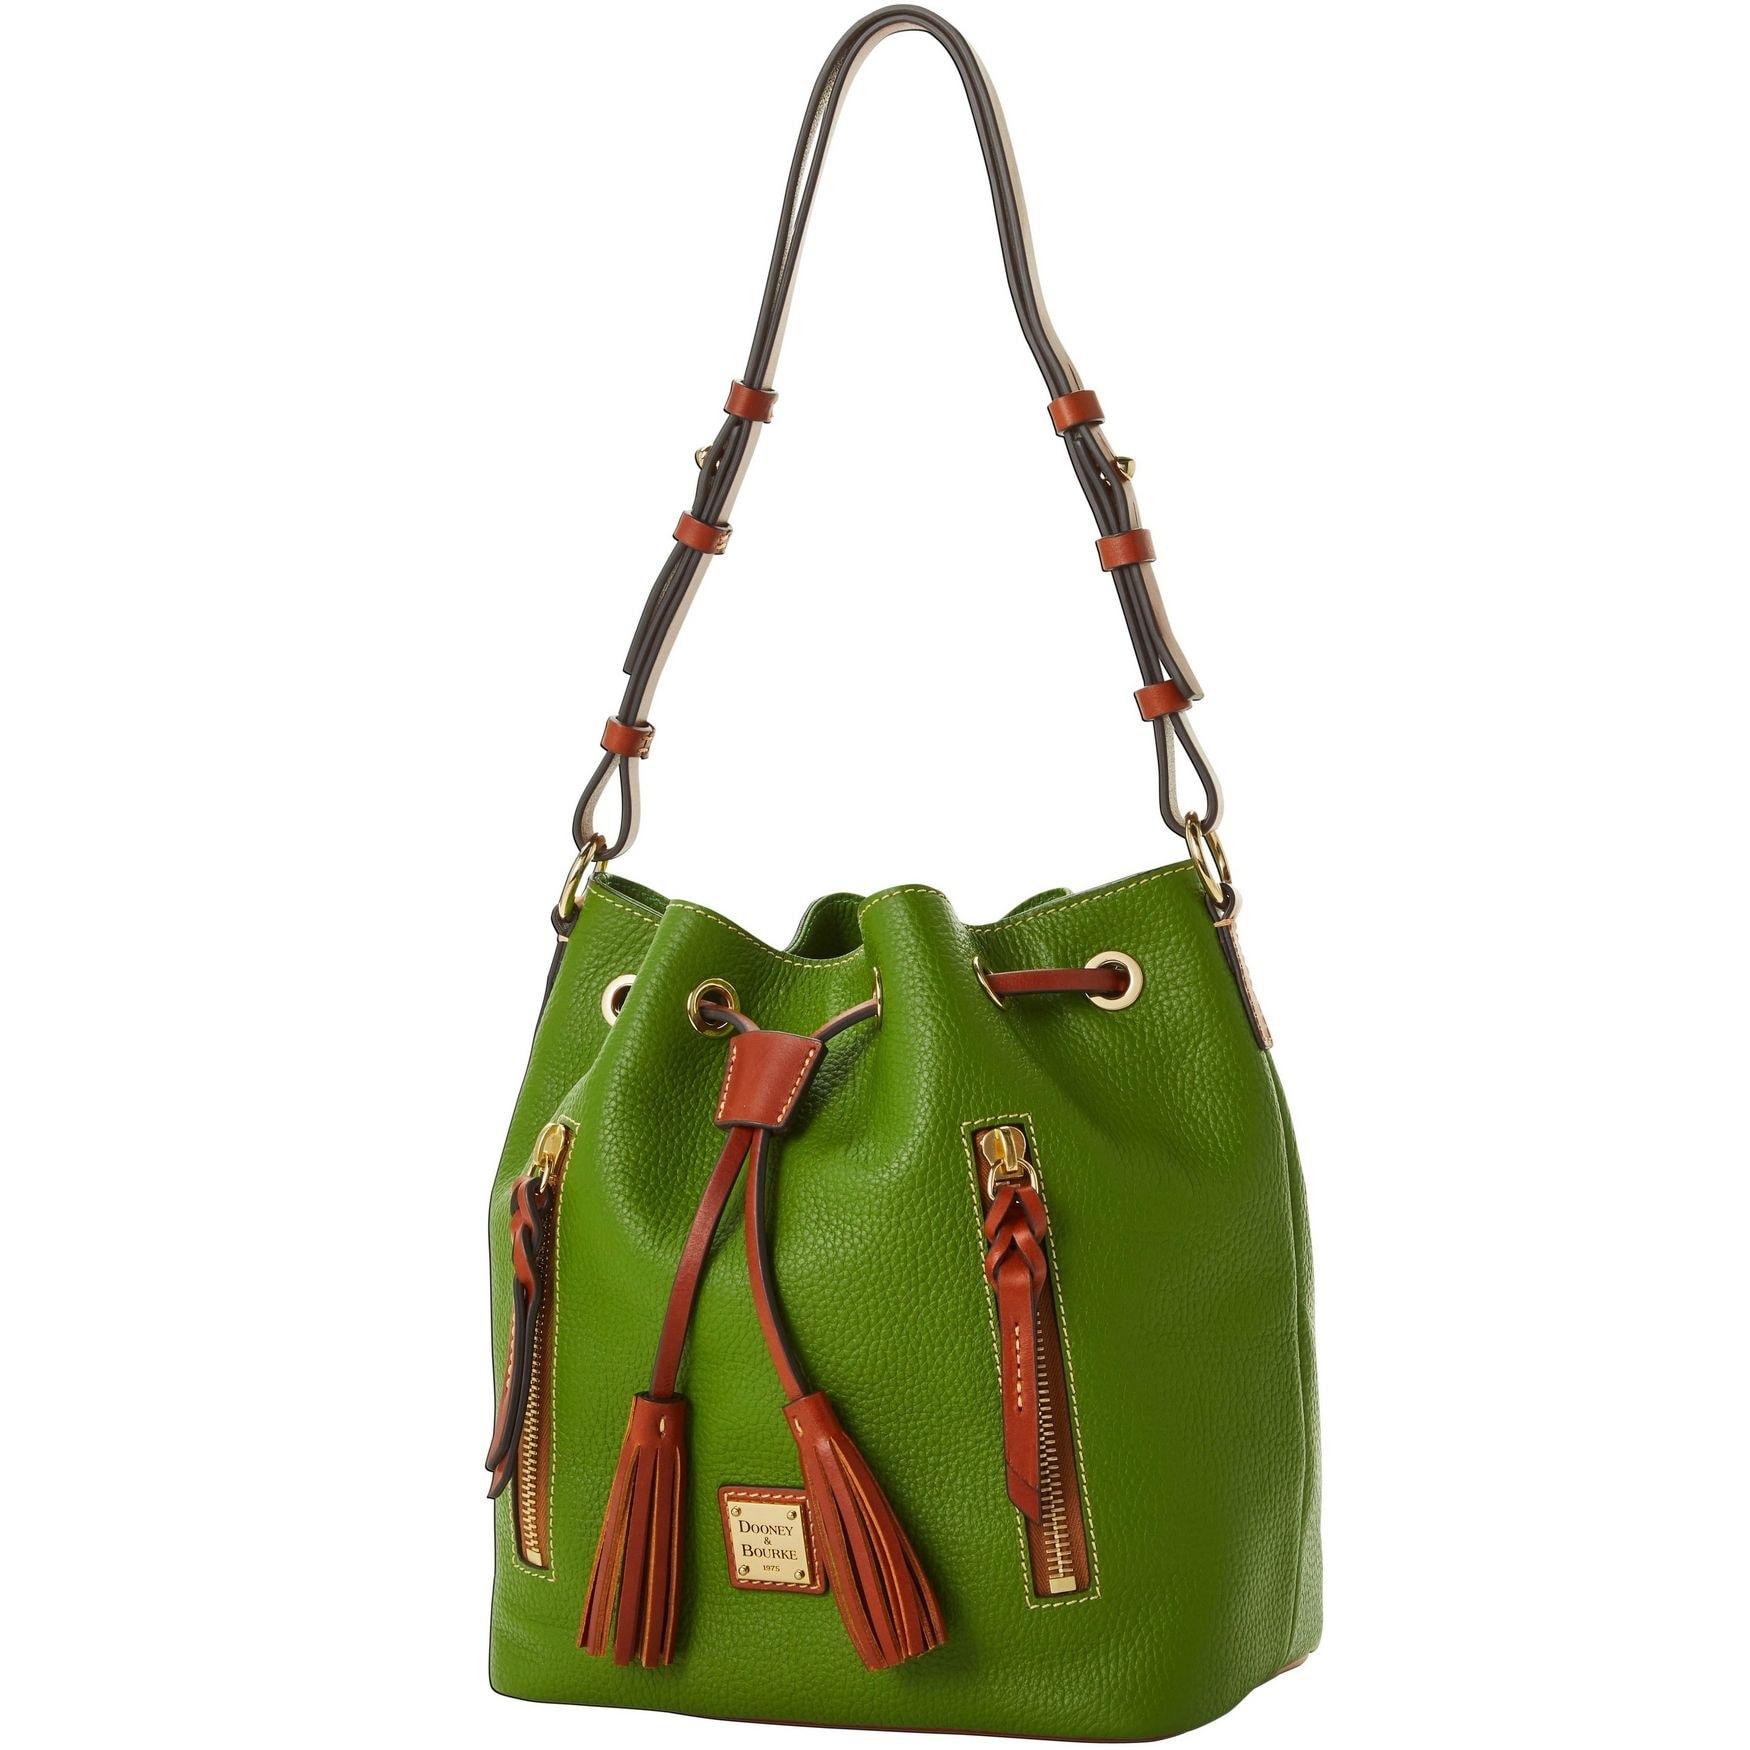 e05d1881353900 Dooney & Bourke Pebble Grain Cooper Drawstring Shoulder Bag (Introduced by  Dooney & Bourke in )